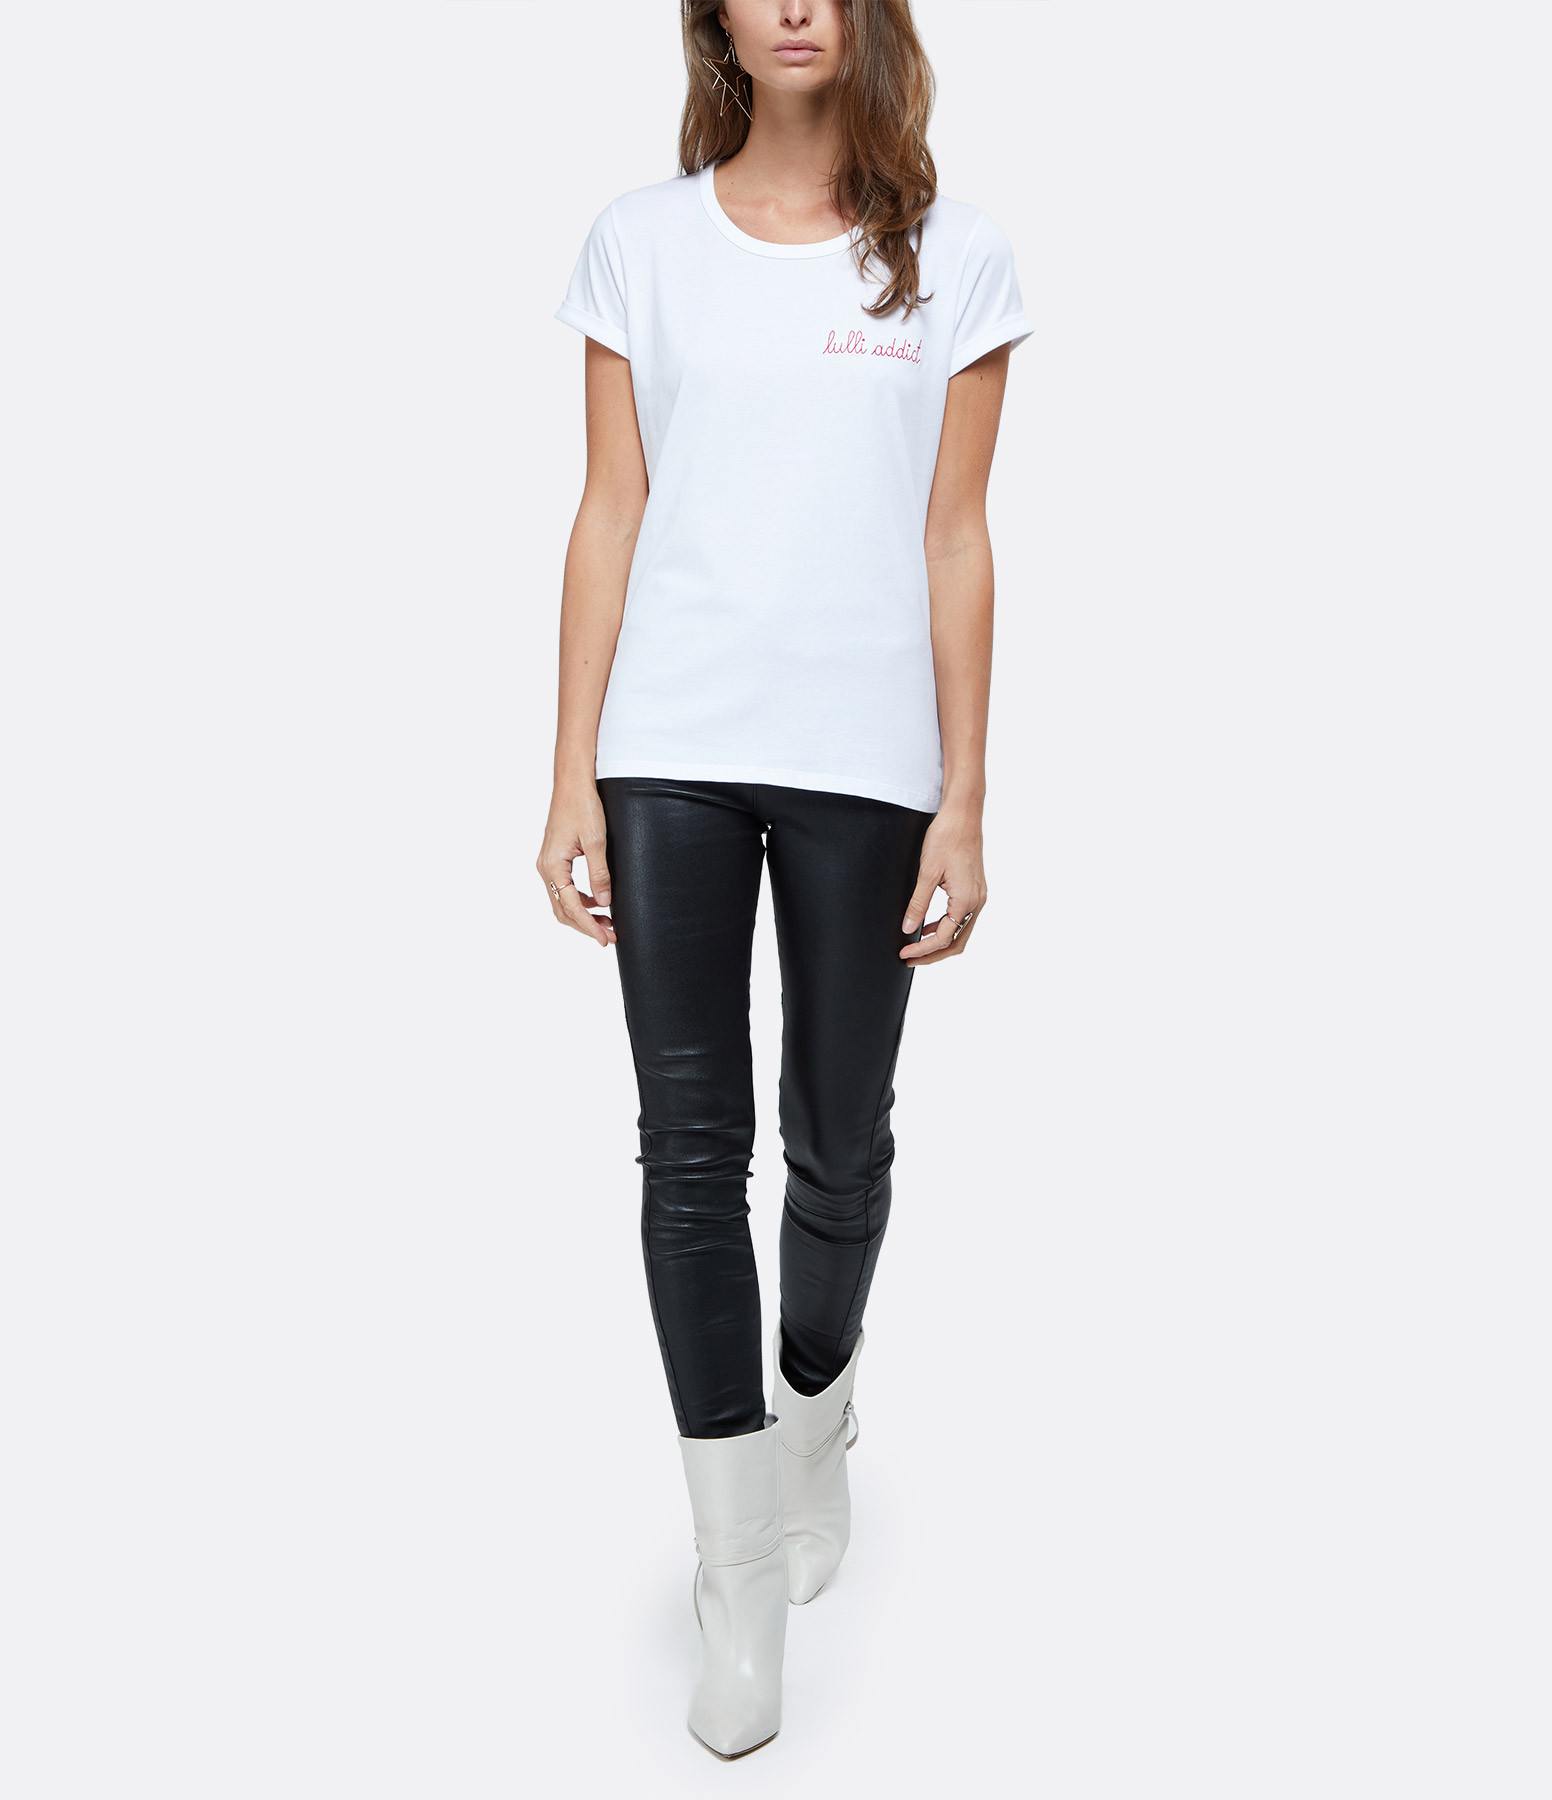 MAISON LABICHE - Tee-shirt Lulli Addict Blanc, Exclusivité Lulli x Maison Labiche